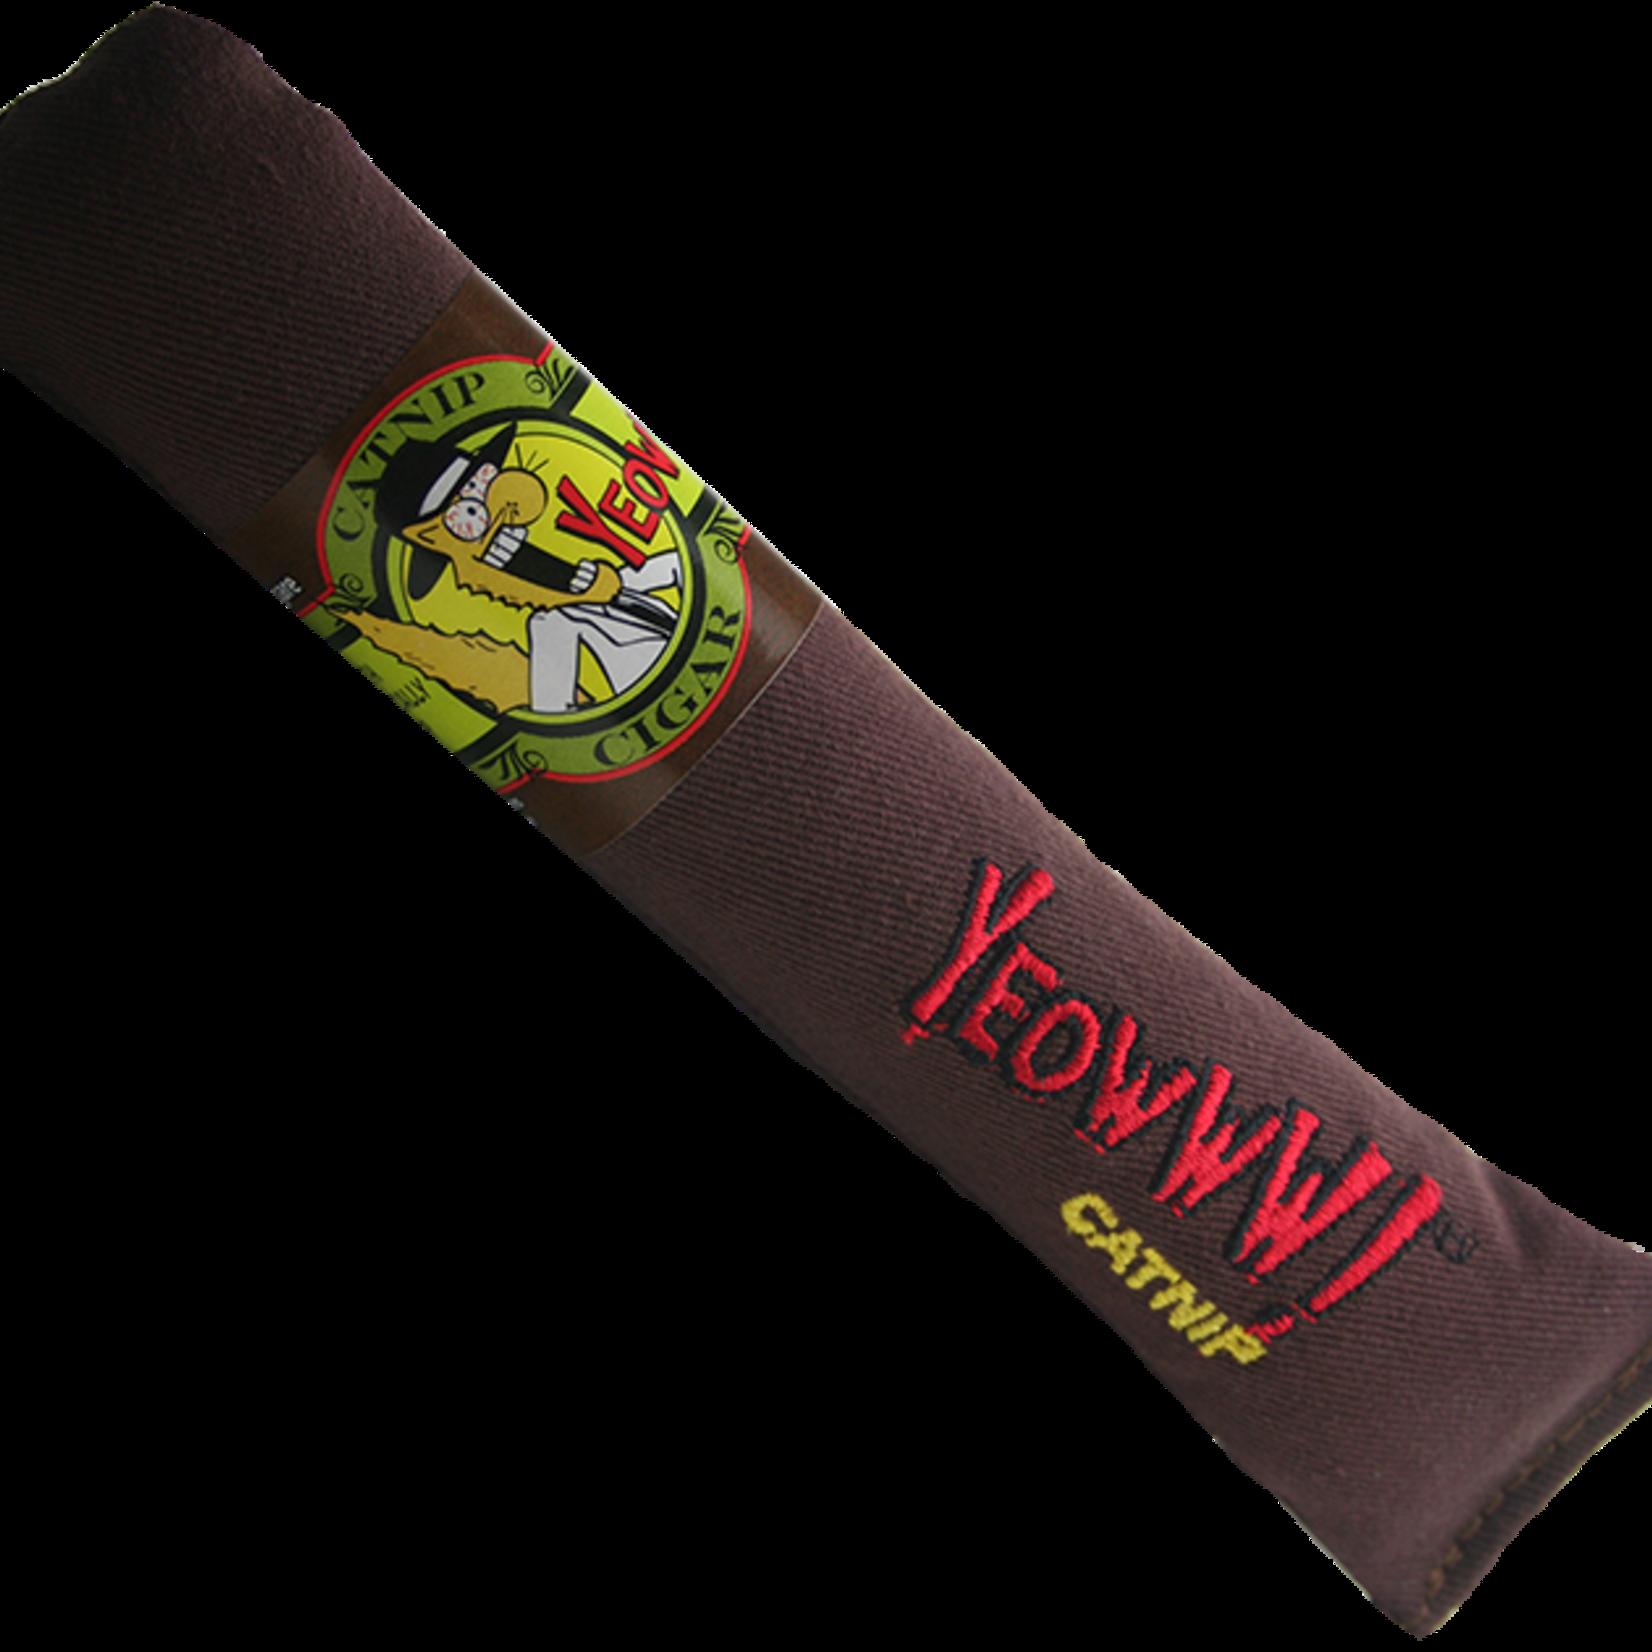 Yeoww Ducky World Inc. Ducky World Yeow! Catnip Cigar